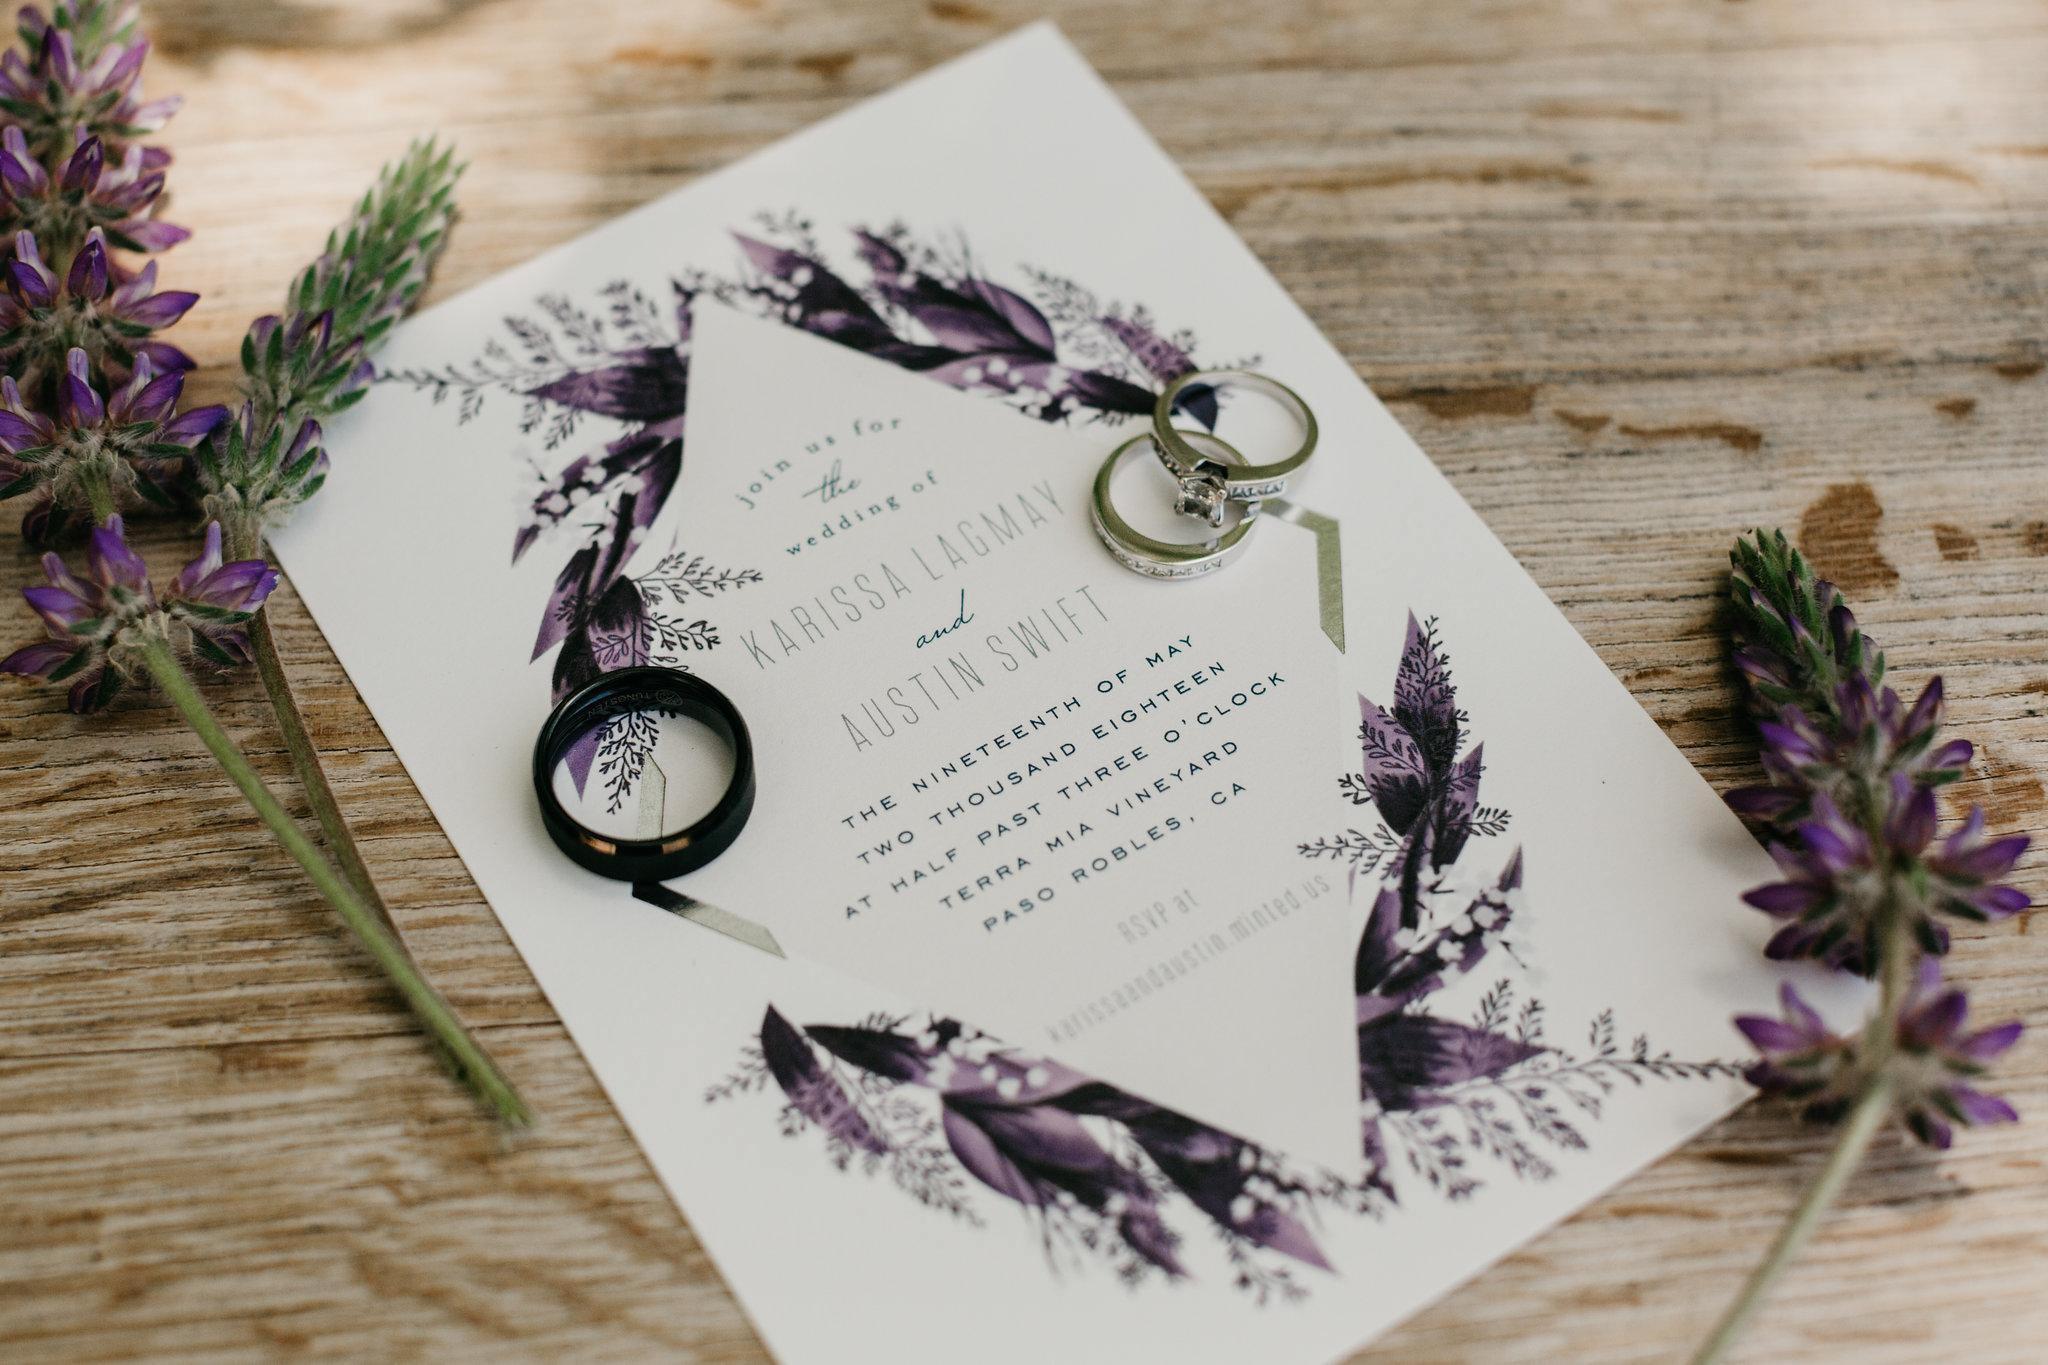 www.santabarbarawedding.com | Terra Mia Vineyard | Diana Lake Photography | Invitation and Wedding Rings